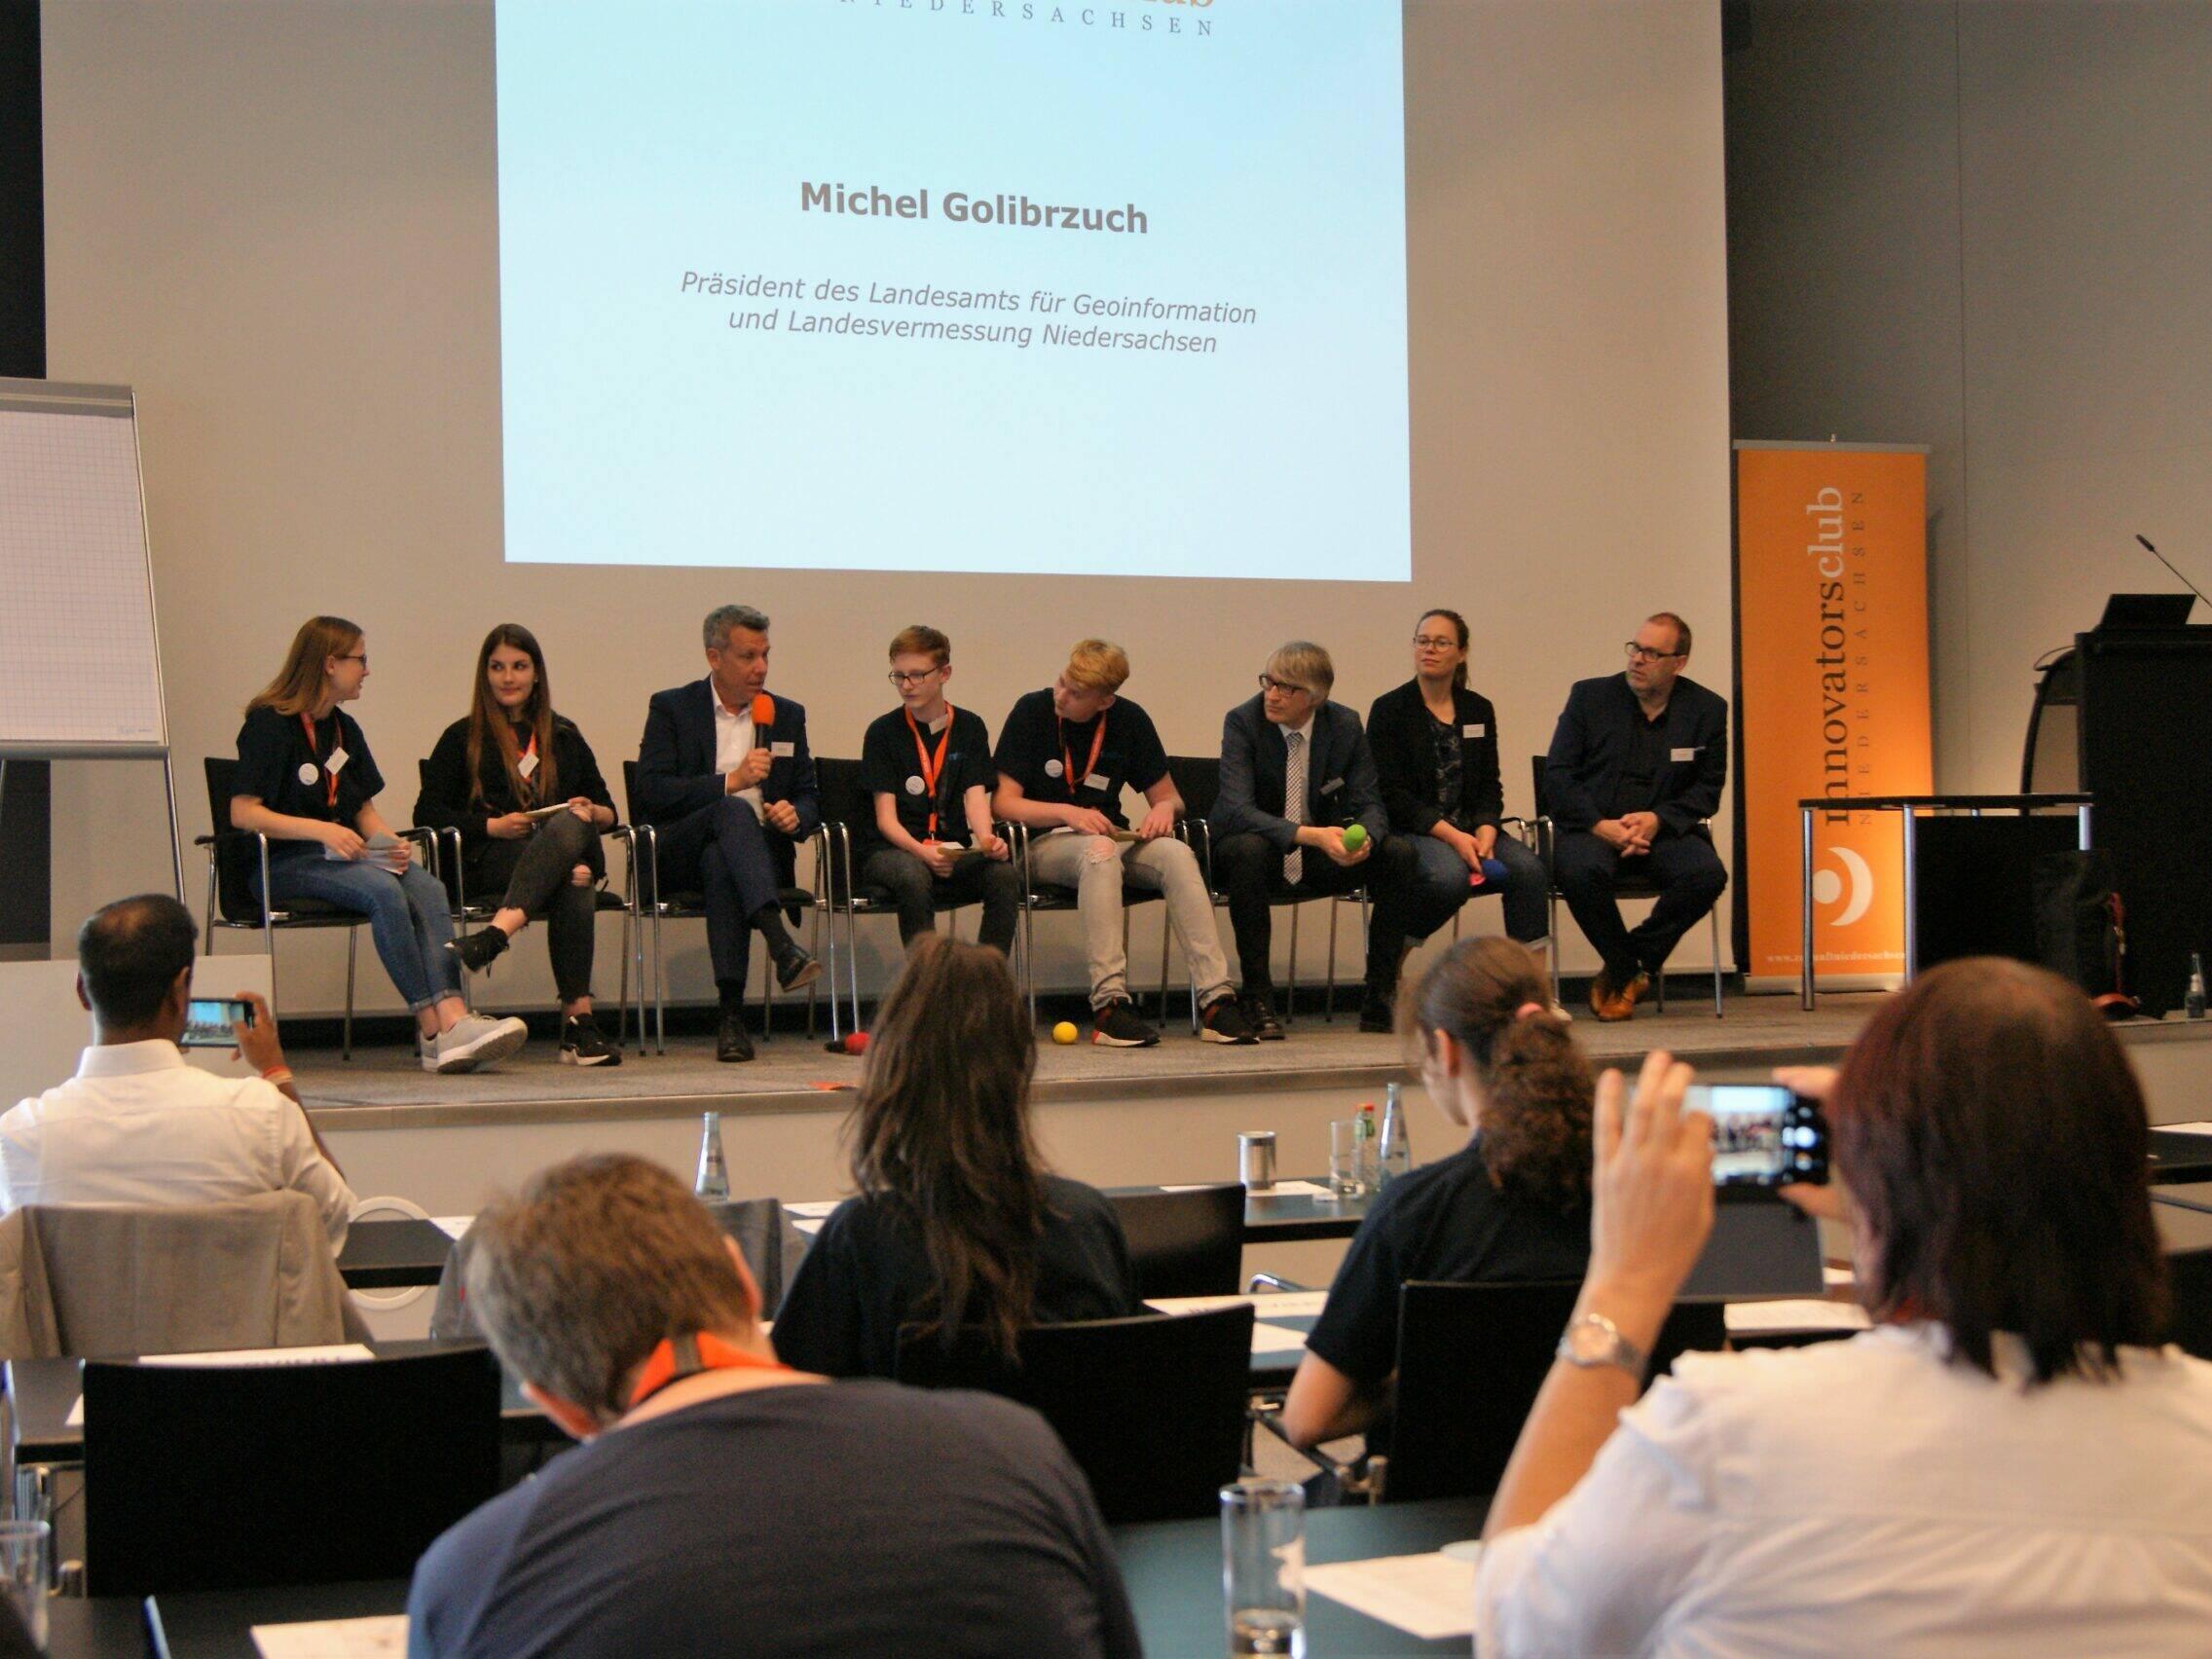 Veranstaltungsbilder innovatorsclub - Podiumsdiskussion